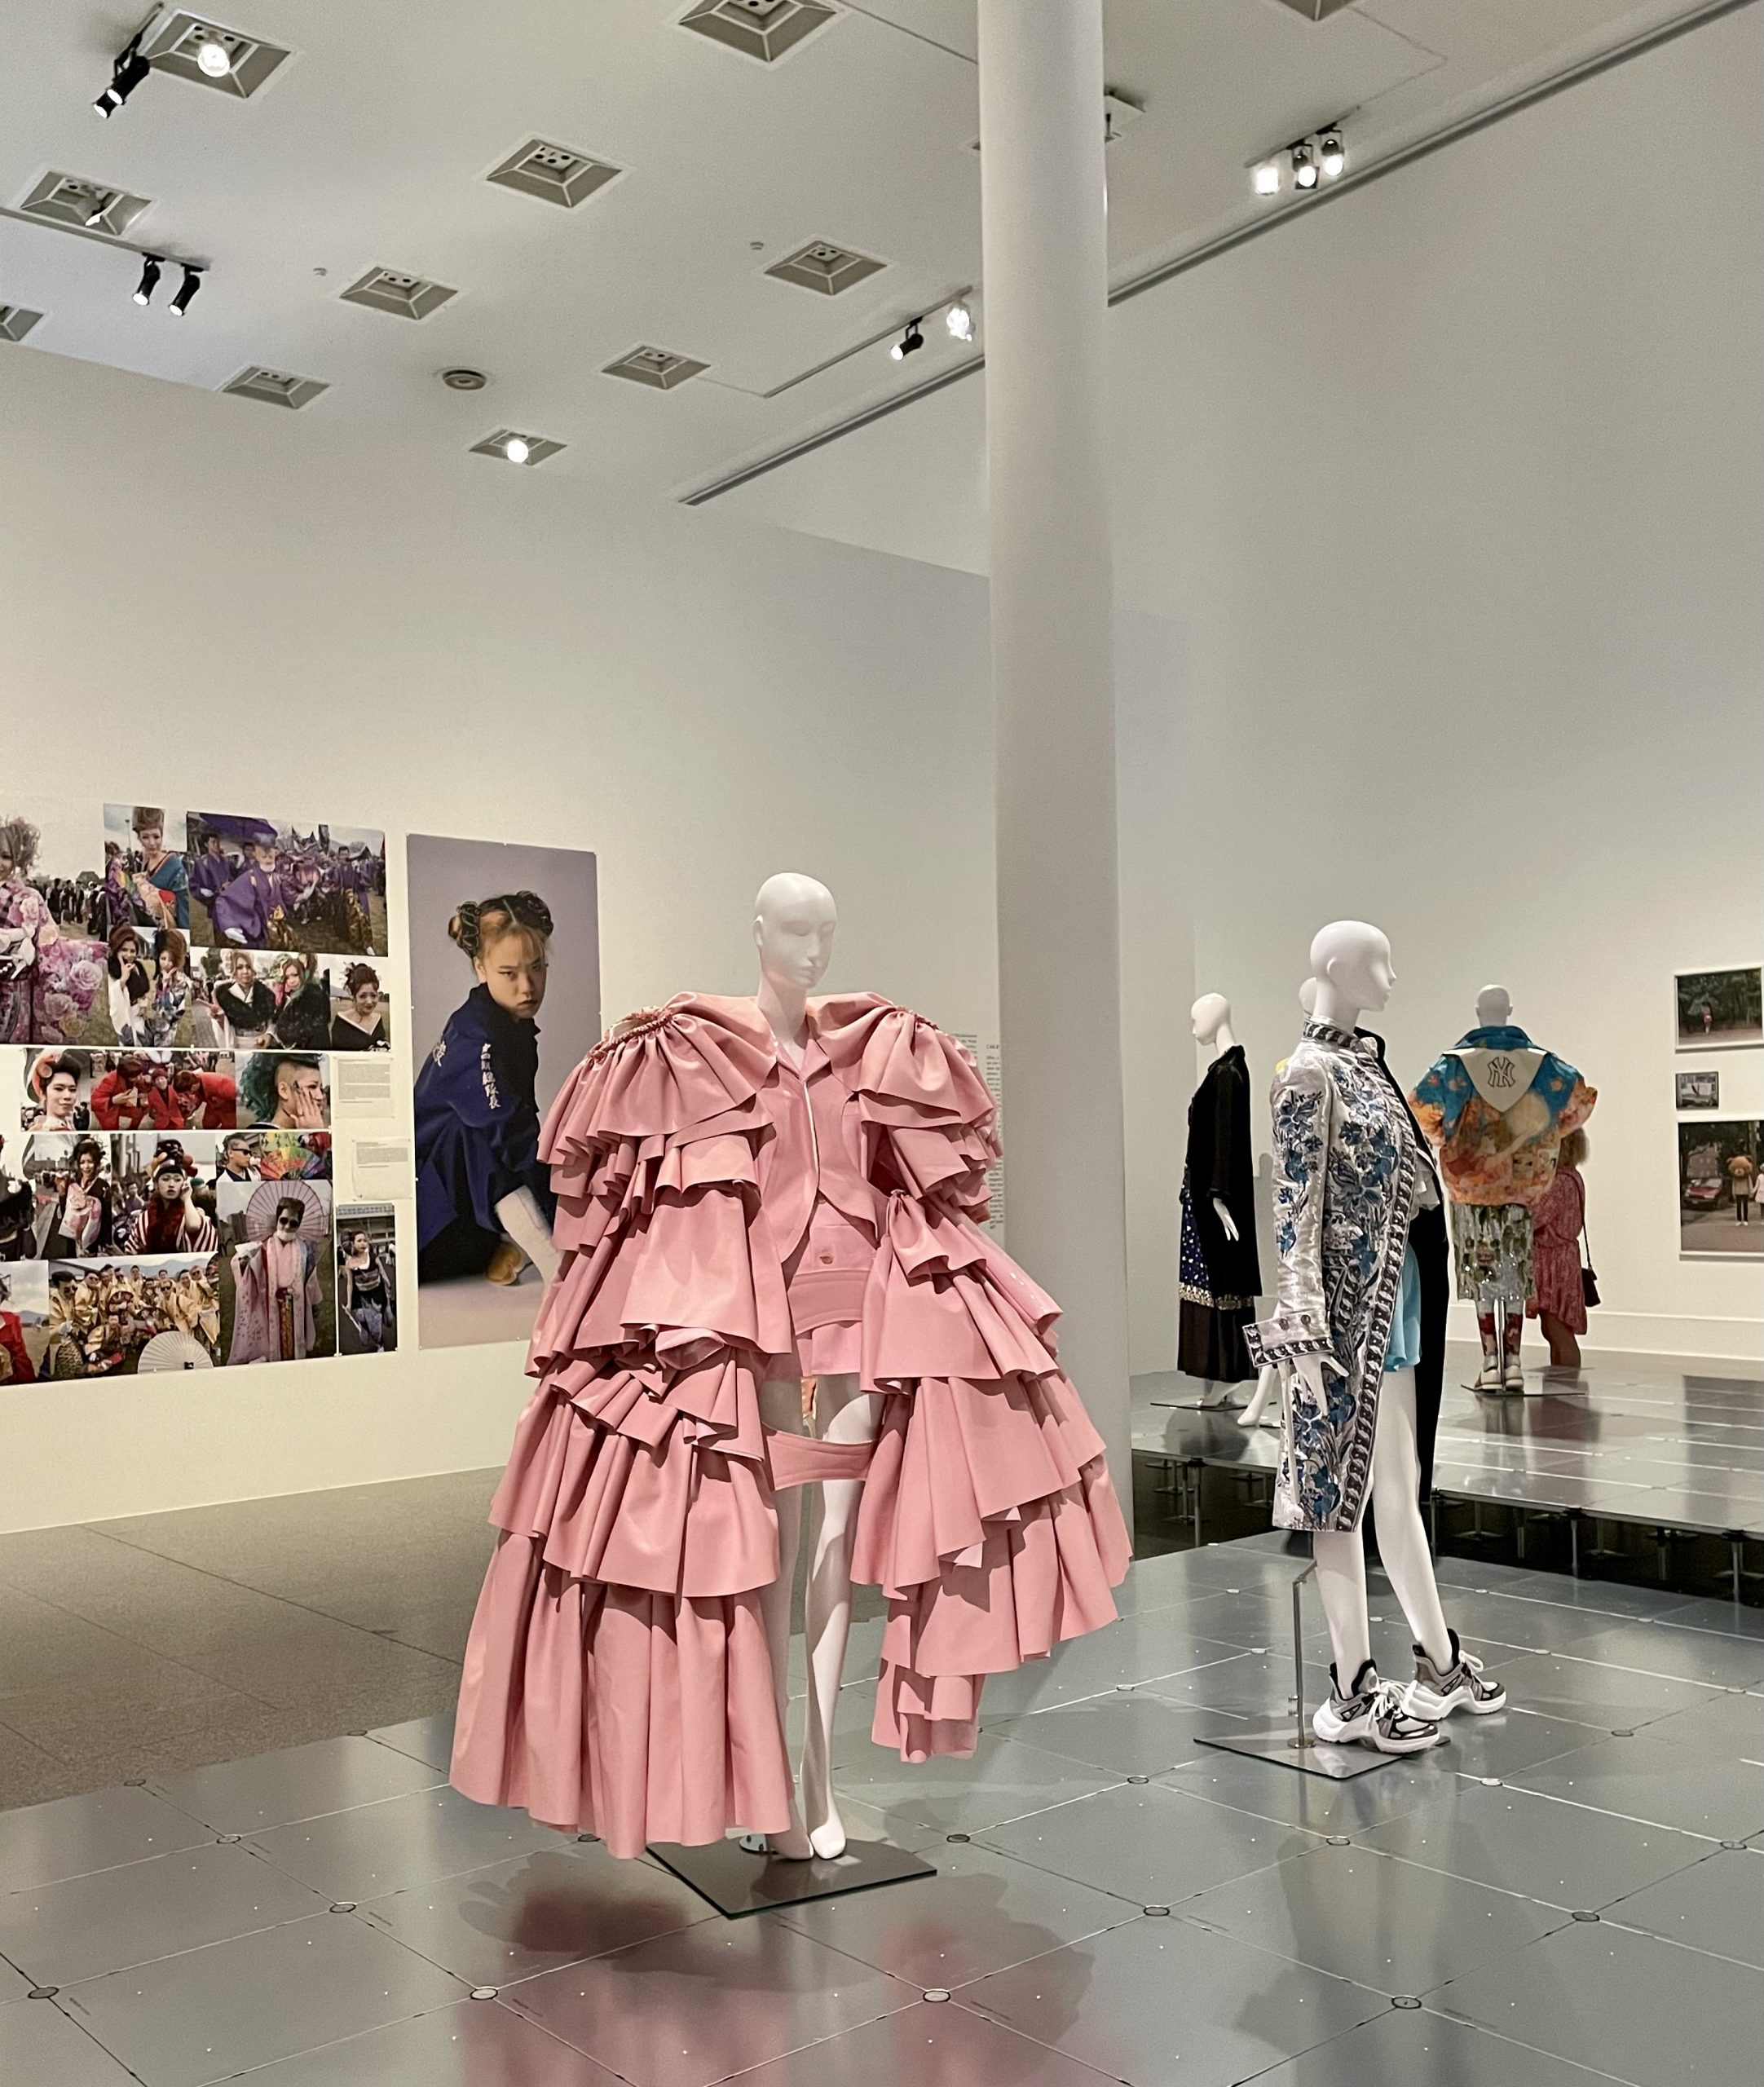 Mode als Spiegel der Gesellschaft